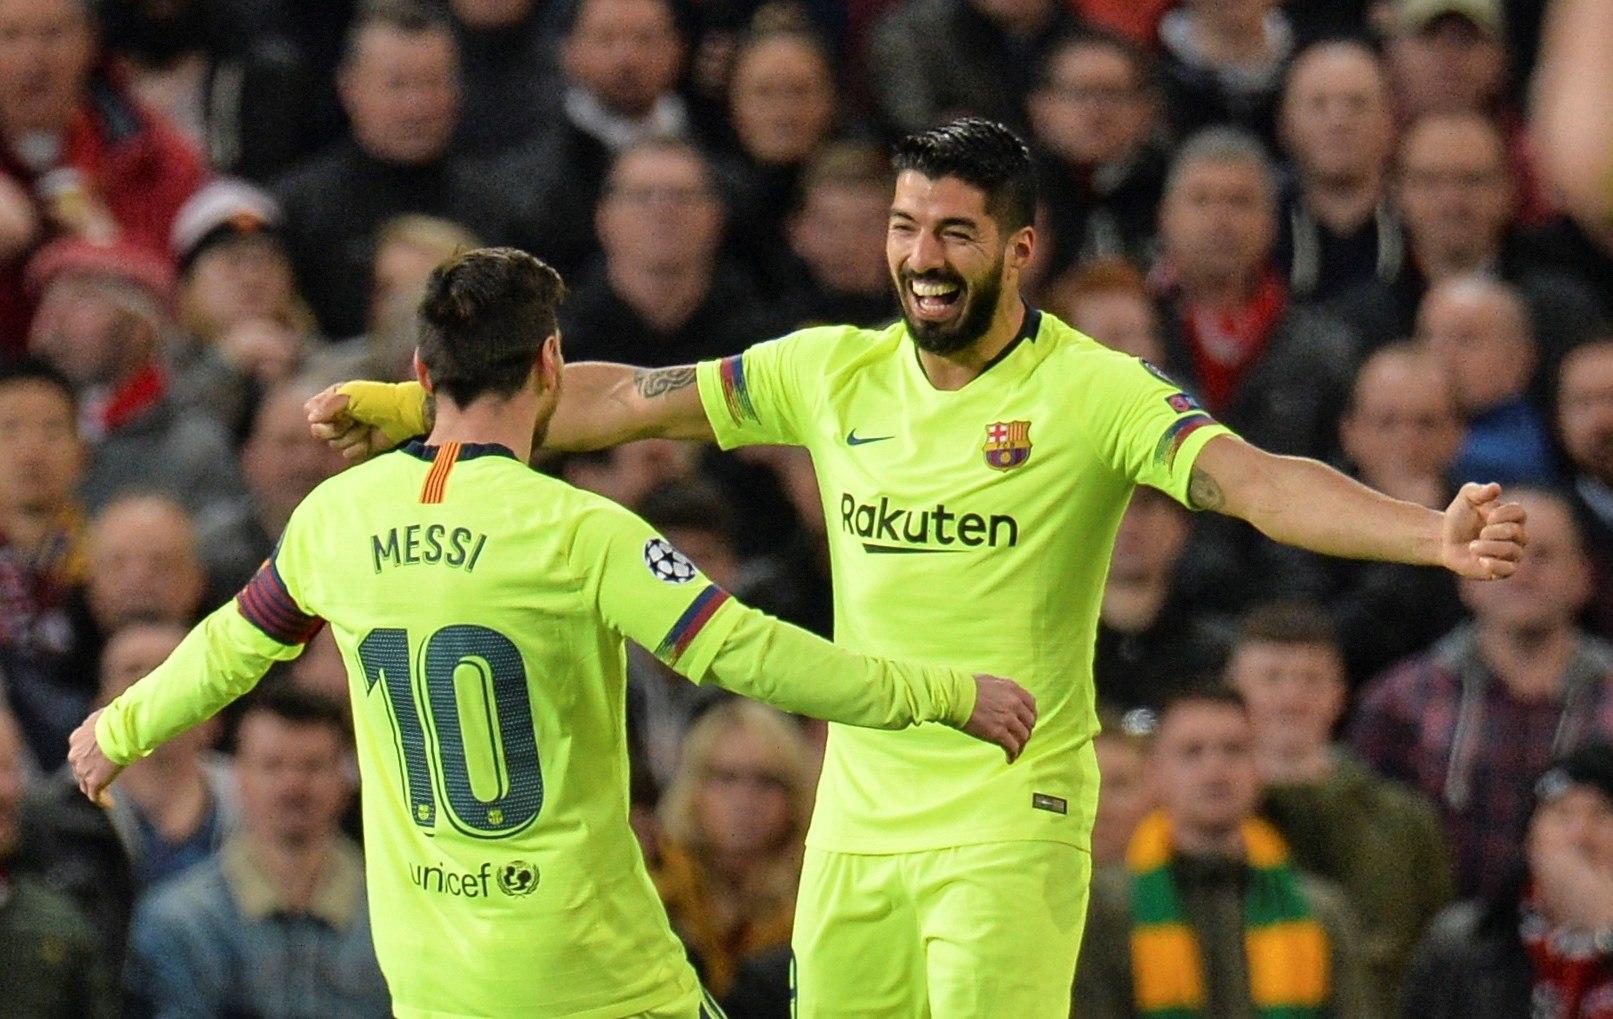 Champions League: Un gol le basta al Barcelona para afrontar con ventaja la vuelta